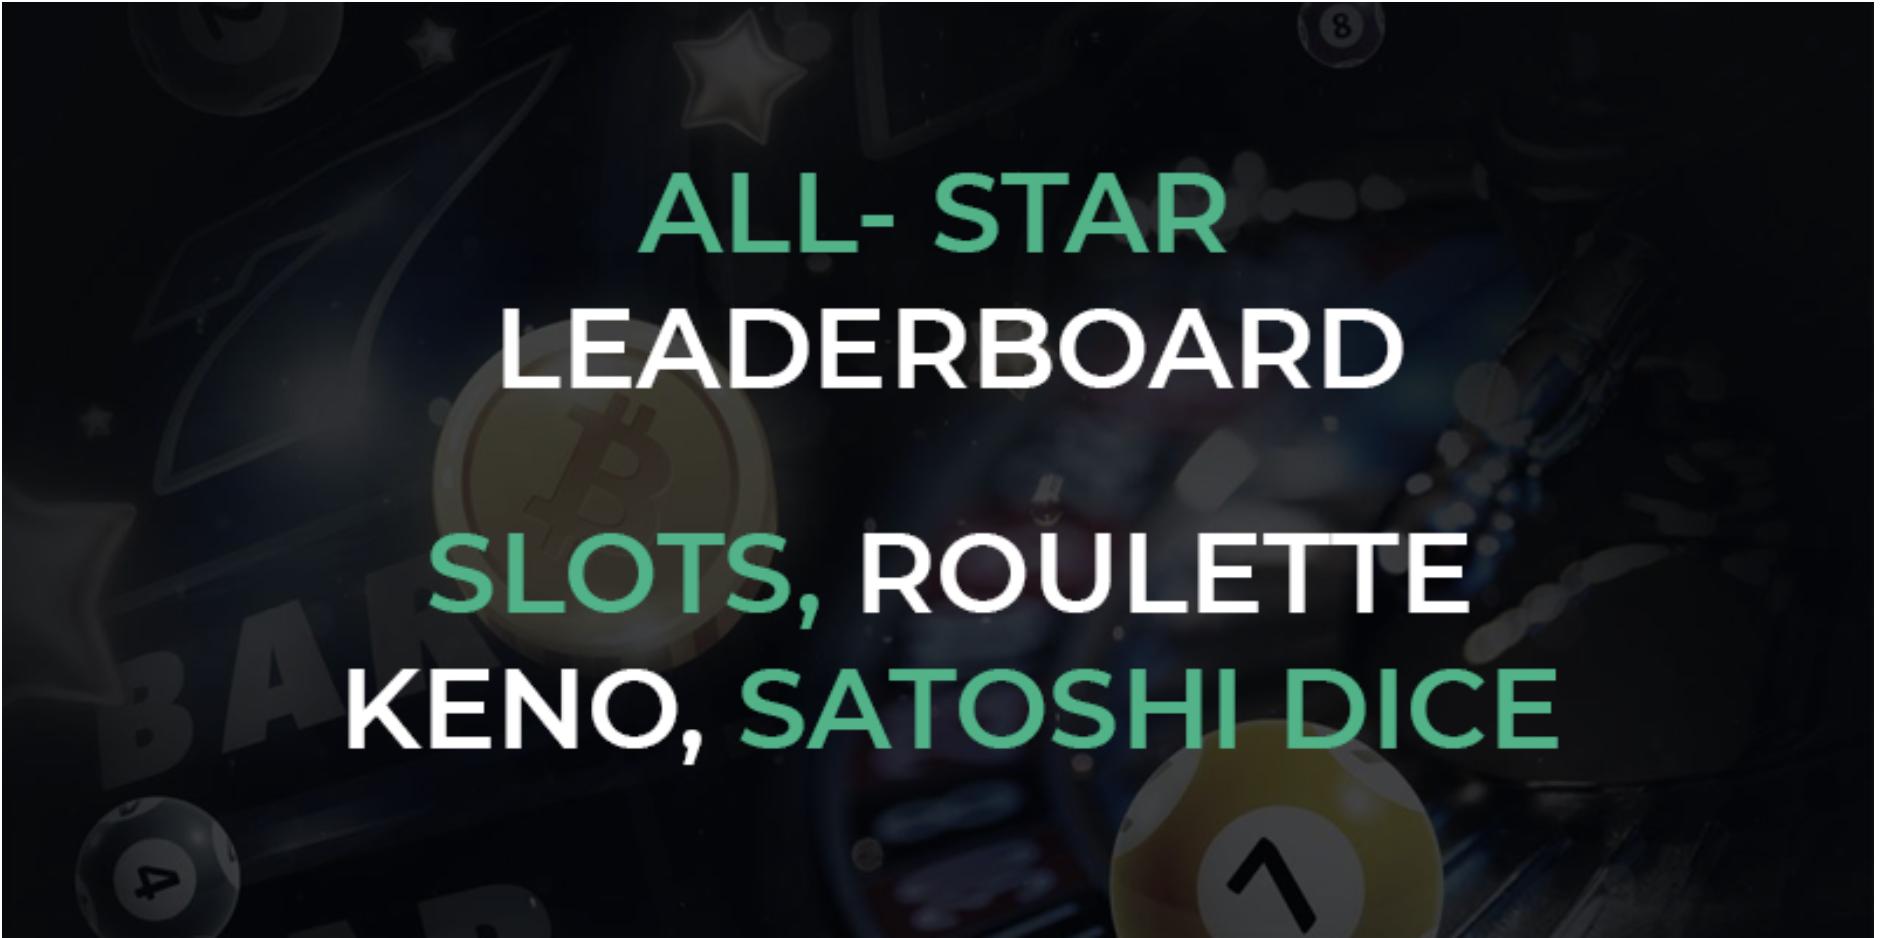 "Bitcoin.com lanza la tabla de clasificación de Games Stars: gana BTC todas las semanas ""width ="" 1880 ""height ="" 938 ""srcset ="" https: // news. bitcoin.com/wp-content/uploads/2019/10/screen-shot-2019-10-04-at-23-01-07.png 1880w, https://news.bitcoin.com/wp-content/uploads /2019/10/screen-shot-2019-10-04-at-23-01-07-300x150.png 300w, https://news.bitcoin.com/wp-content/uploads/2019/10/screen- shot-2019-10-04-at-23-01-07-768x383.png 768w, https://news.bitcoin.com/wp-content/uploads/2019/10/screen-shot-2019-10-04 -at-23-01-07-1024x511.png 1024w, https://news.bitcoin.com/wp-content/uploads/2019/10/screen-shot-2019-10-04-at-23-01- 07-696x347.png 696w, https://news.bitcoin.com/wp-content/uploads/2019/10/screen-shot-2019-10-04-at-23-01-07-1392x695.png 1392w, https://news.bitcoin.com/wp-content/uploads/2019/10/screen-shot-2019-10-04-at-23-01-07-1068x533.png 1068w, https: //news.bitcoin .com / wp-content / uploads / 2019/10 / screen-shot-2019-10-04-at-23-01-07-842x420.png 842w ""tamaños ="" (ancho máximo: 1880px) 100vw, 1880px"